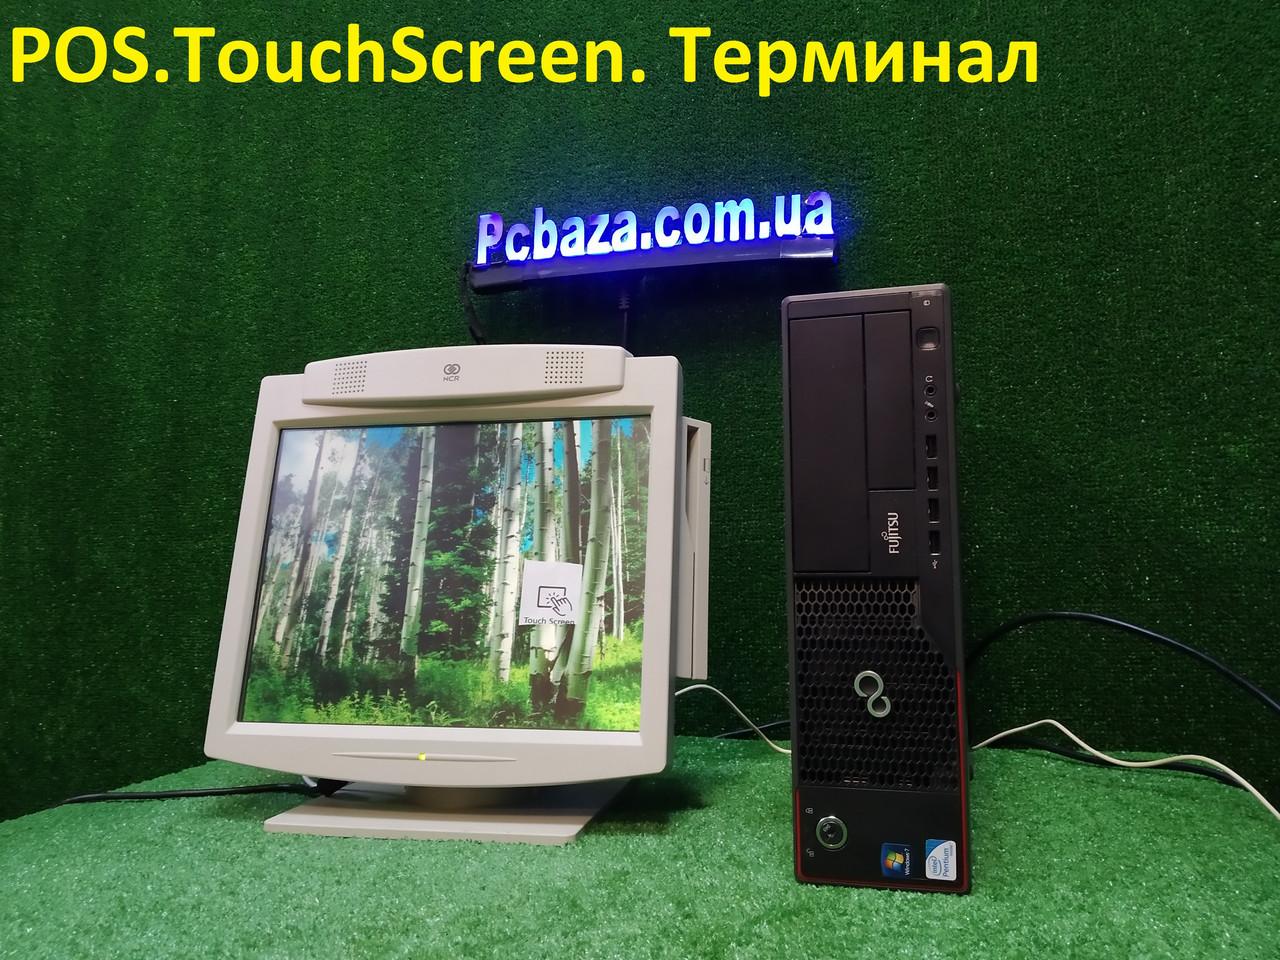 "POS Торговый терминал Fujitsu E700\4gb\160GB + 15"" LG Touchscreen"